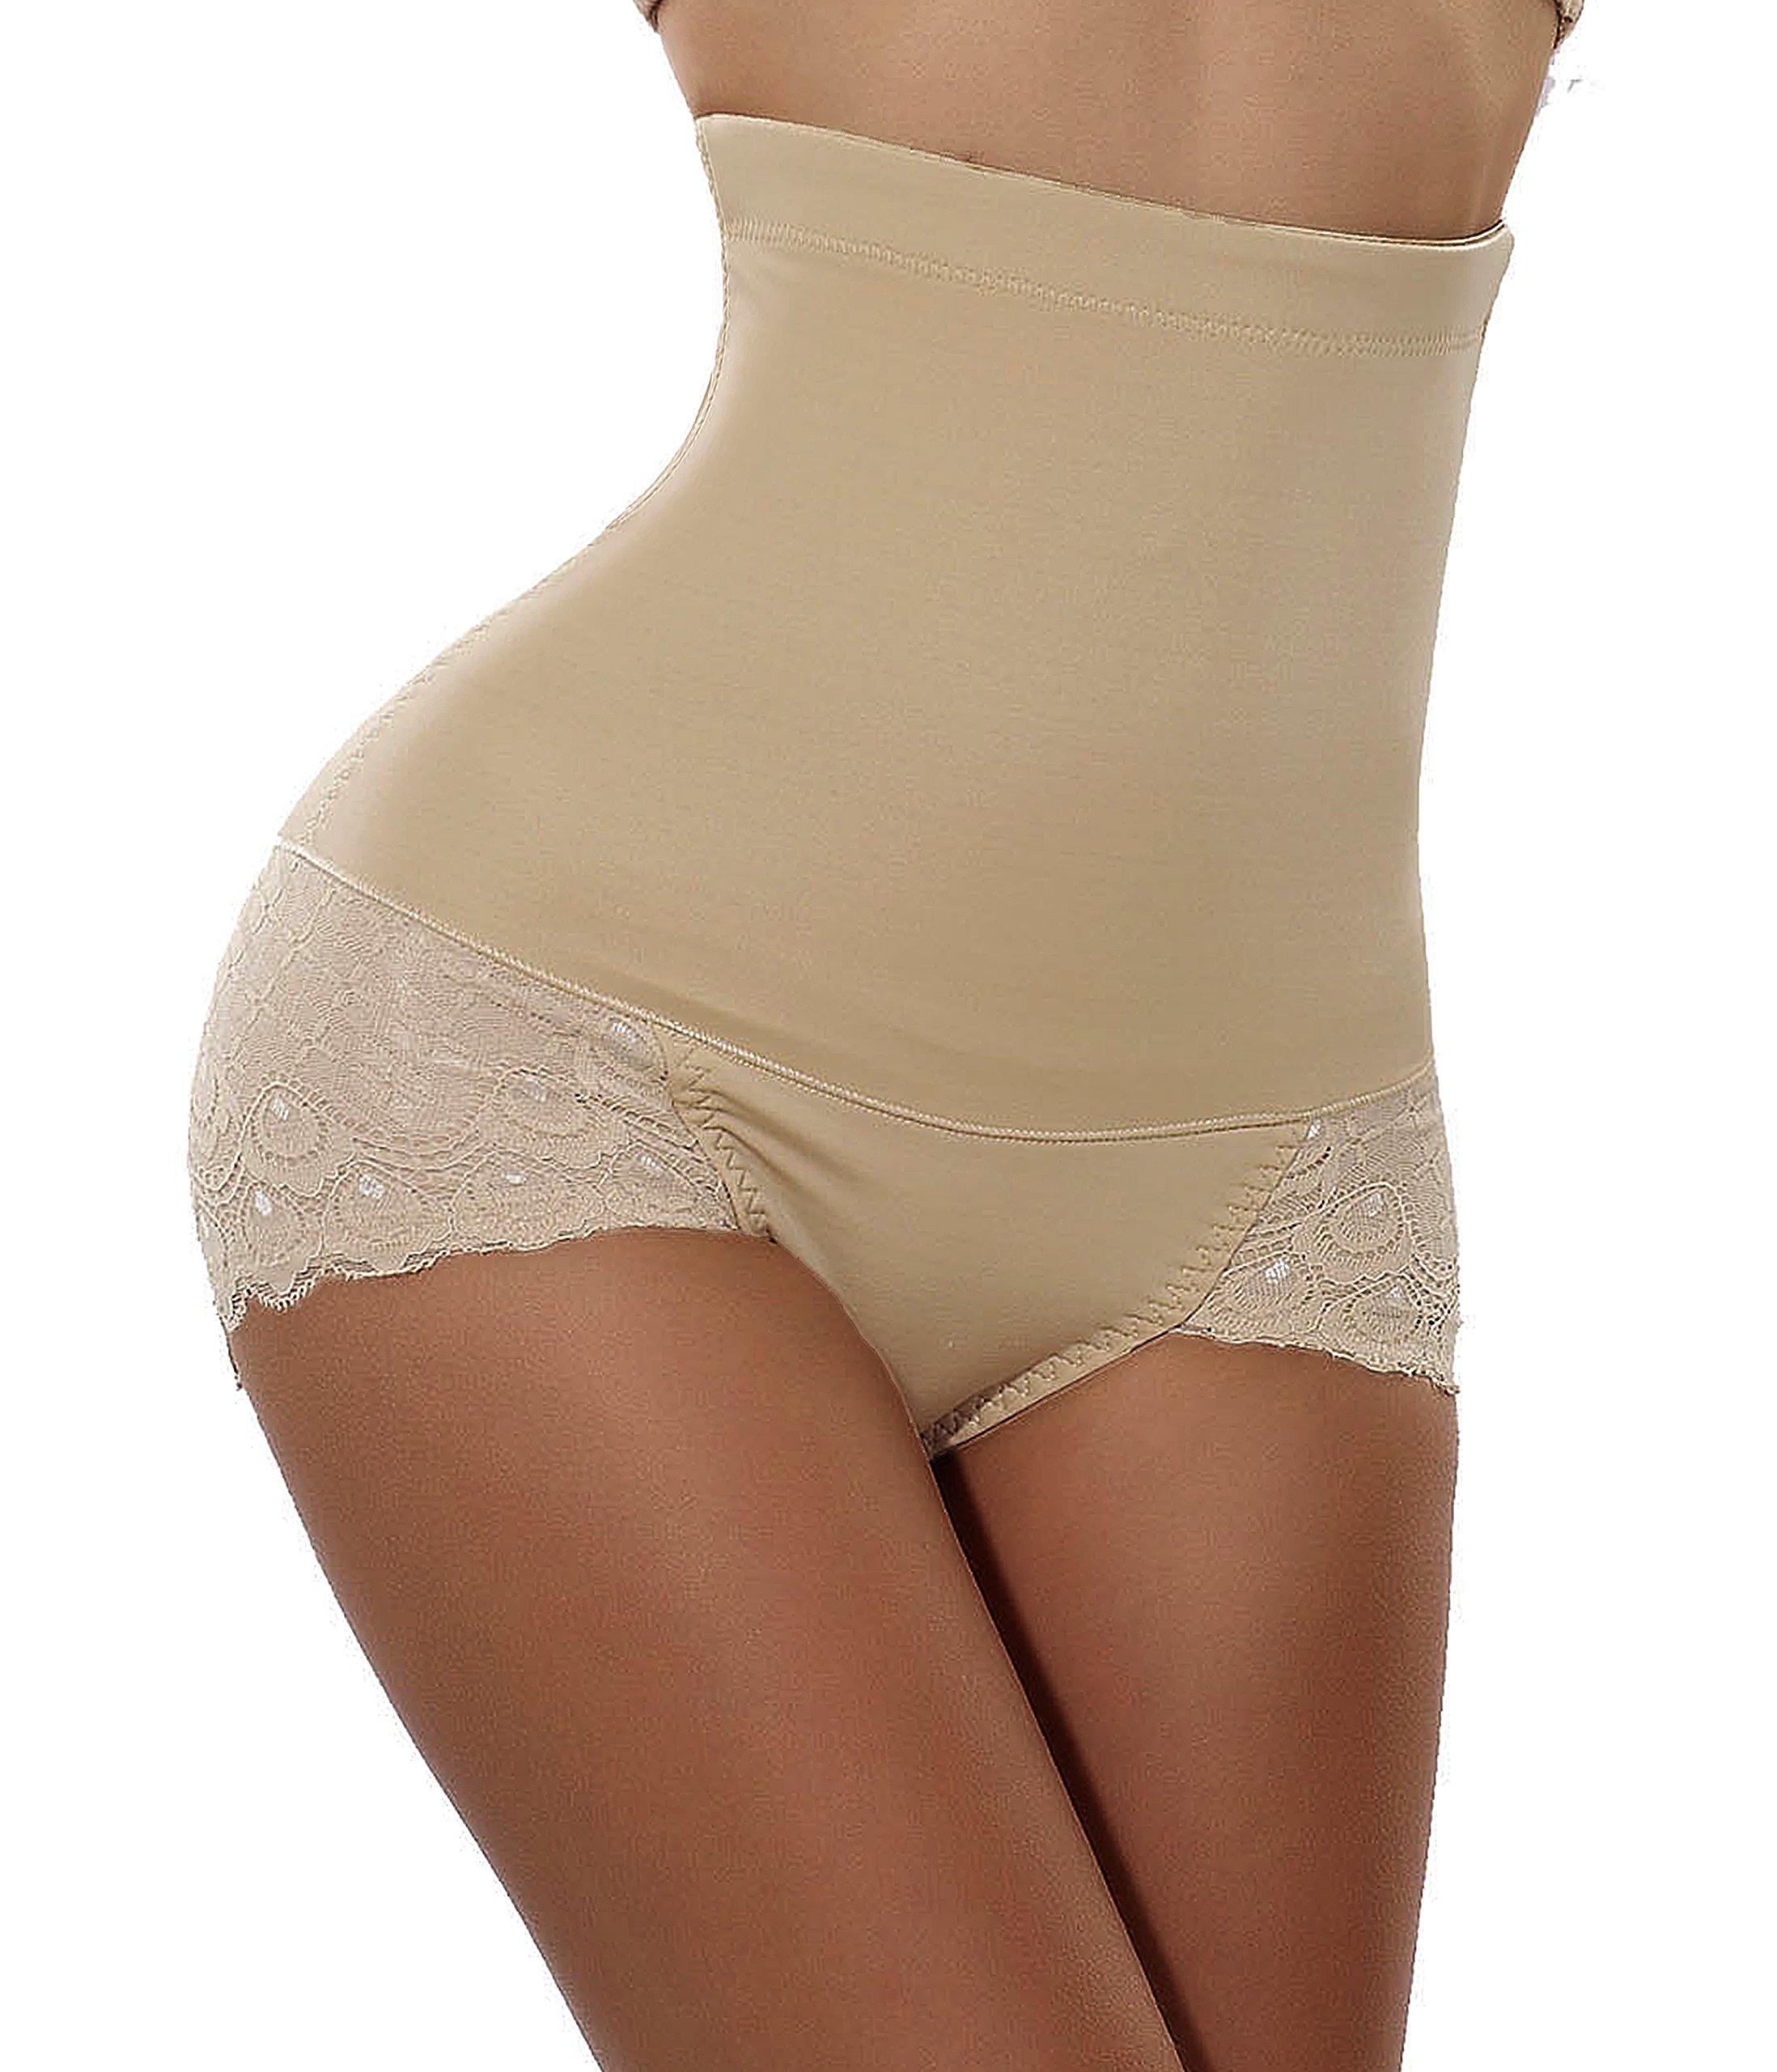 Gotoly Hip Abundant,Body Shaper High Waist Tummy Control Butt Lifter Panty Slim Small, Beige(Super Comfy)